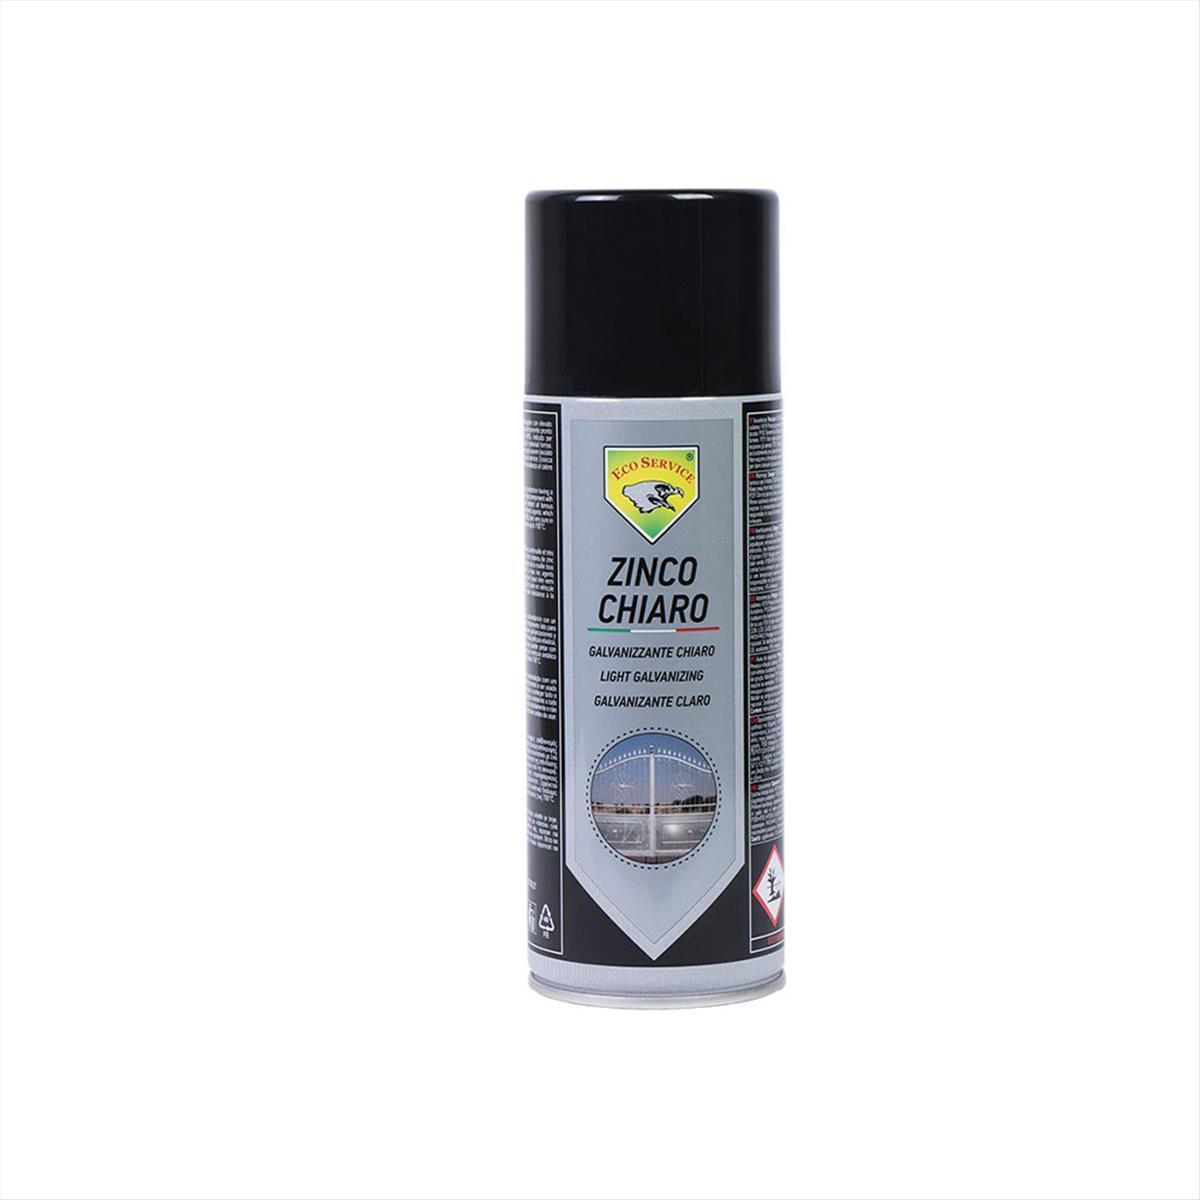 eco-service-zinco-chiaro-sprei-galvanismatos-gkri-lampero-400ml.jpg